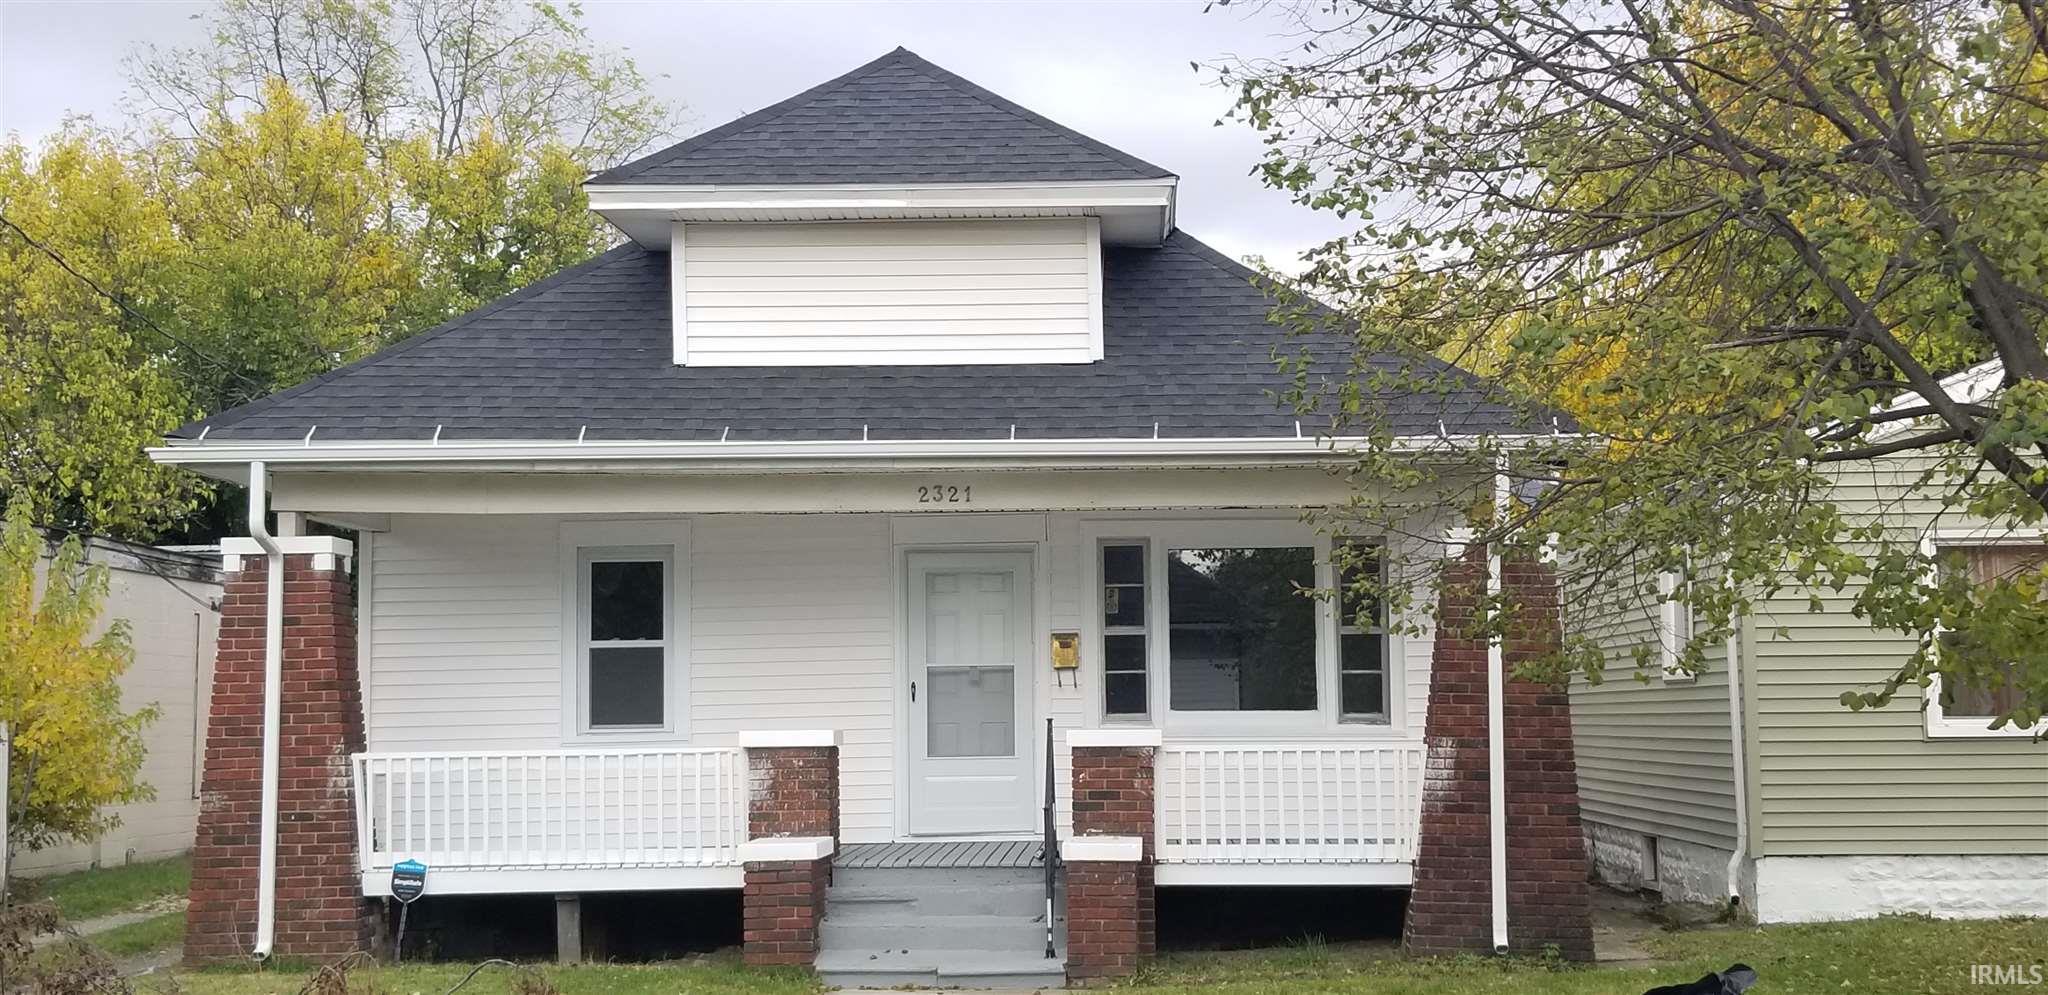 2321 Bertrand South Bend, IN 46628